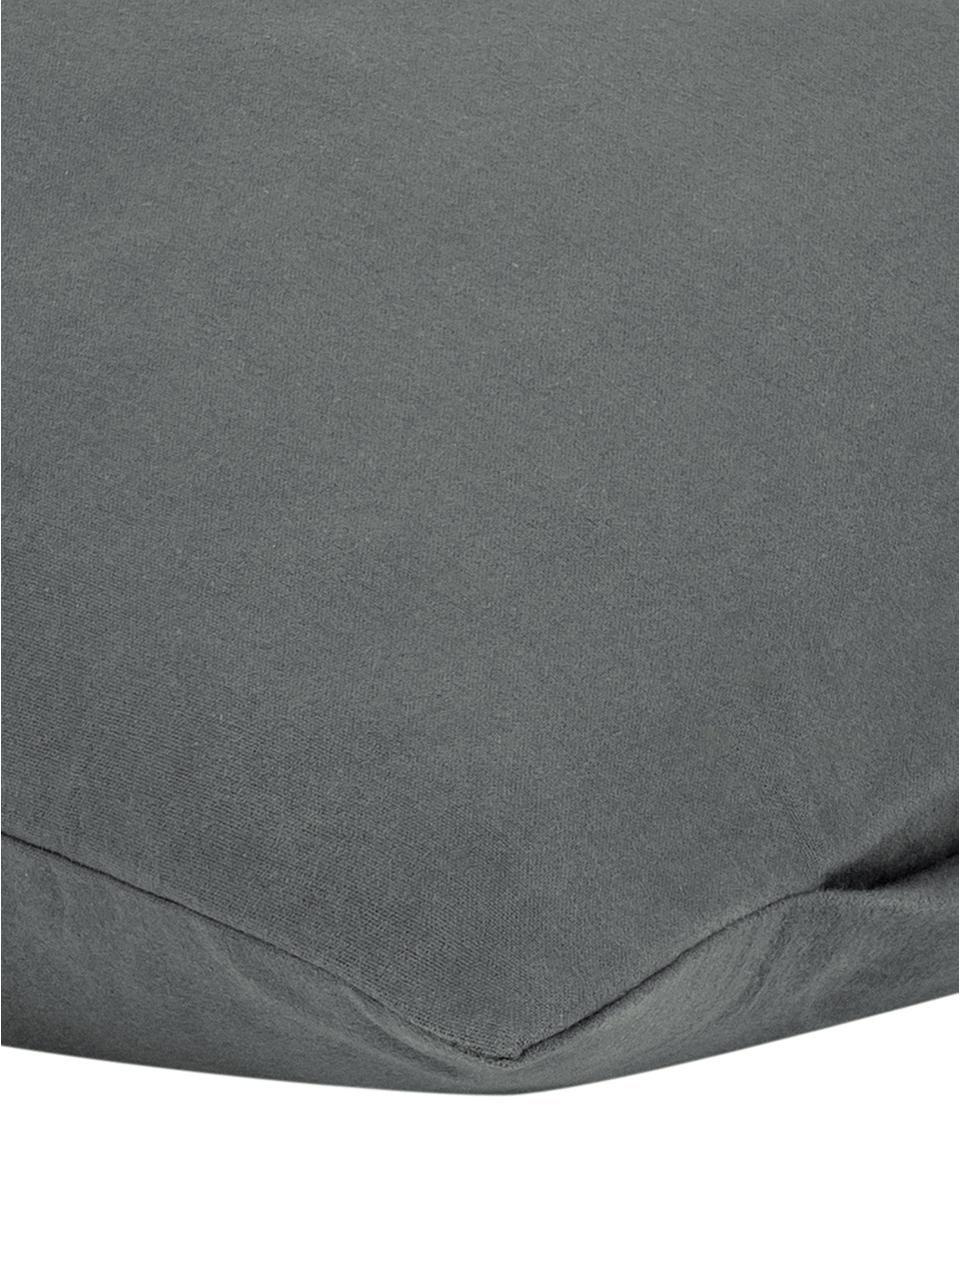 Flanell-Kissenbezüge Biba in Dunkelgrau, 2 Stück, Webart: Flanell Flanell ist ein k, Dunkelgrau, 40 x 80 cm